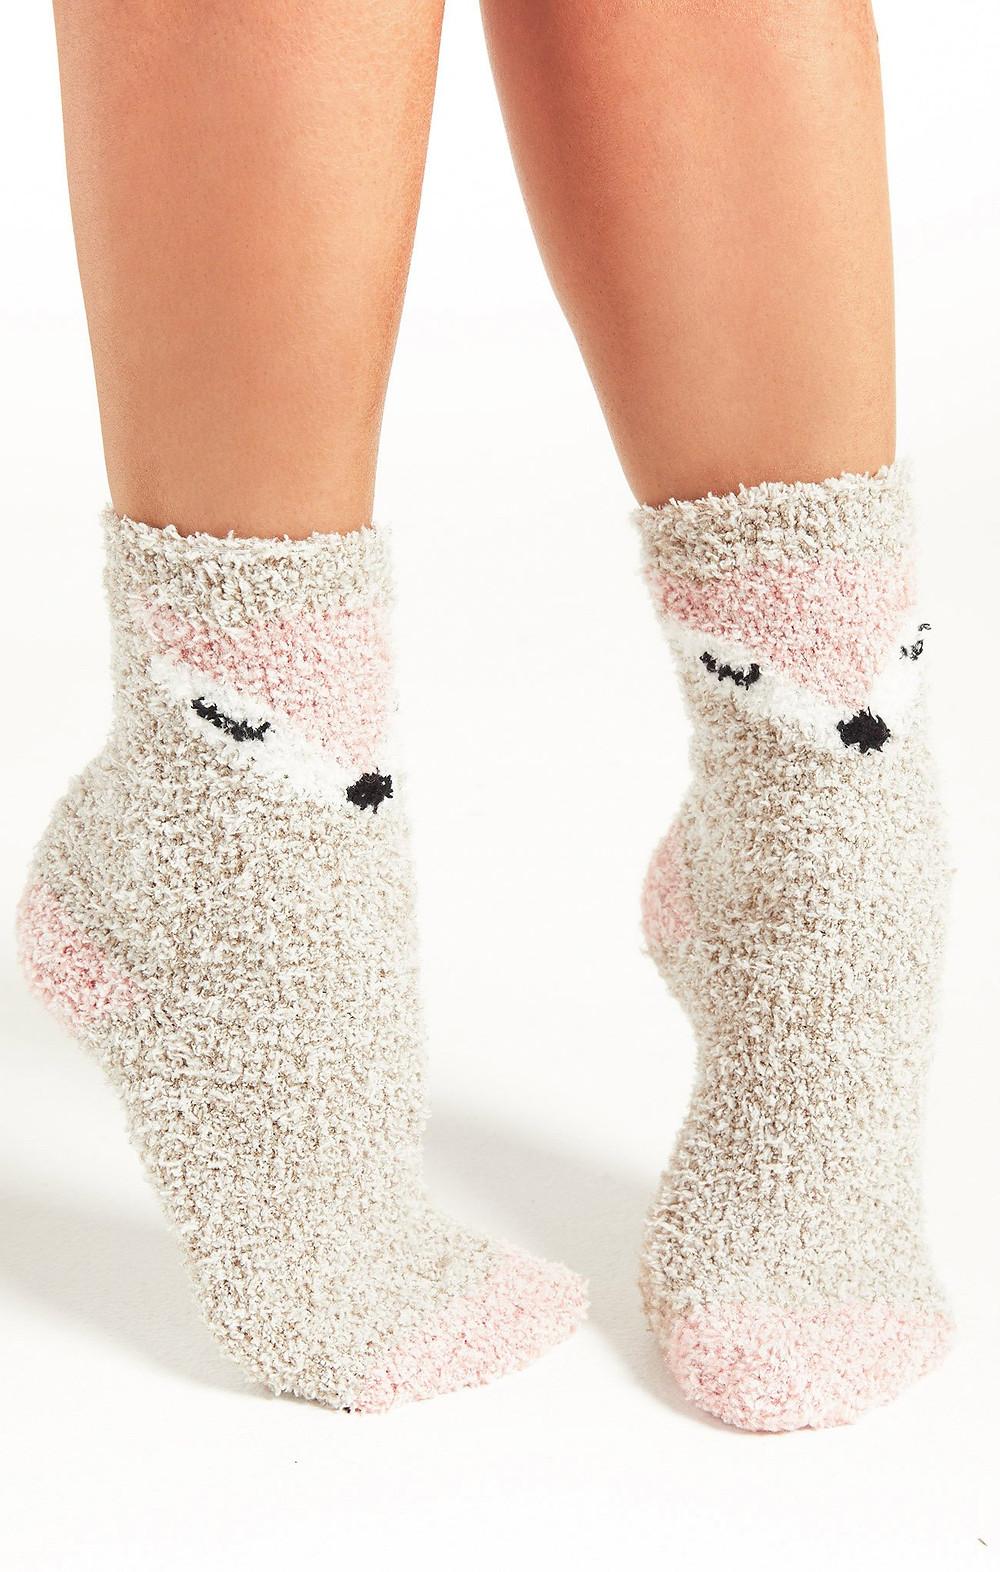 ZSupply-Plush-Socks-Foxy-Cozy-Loungewear